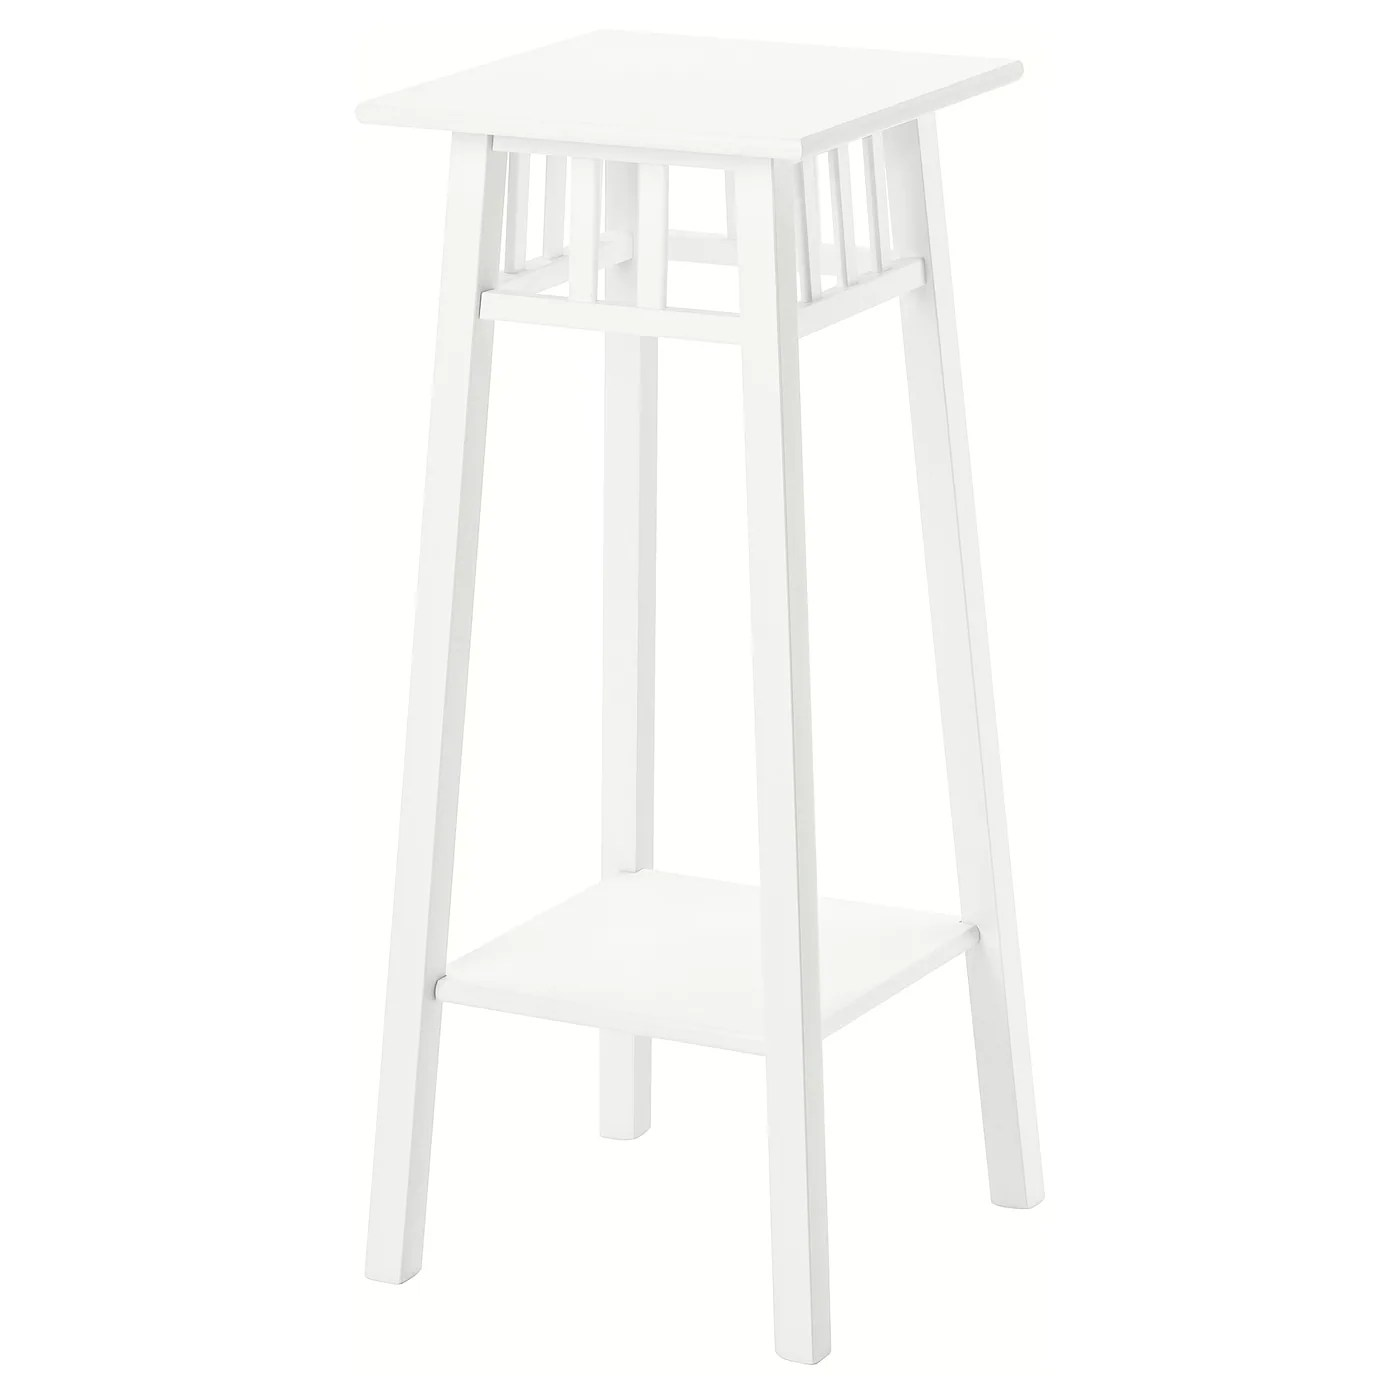 Lantliv Piedestal Blanc 78 Cm Materiau Durable Ikea